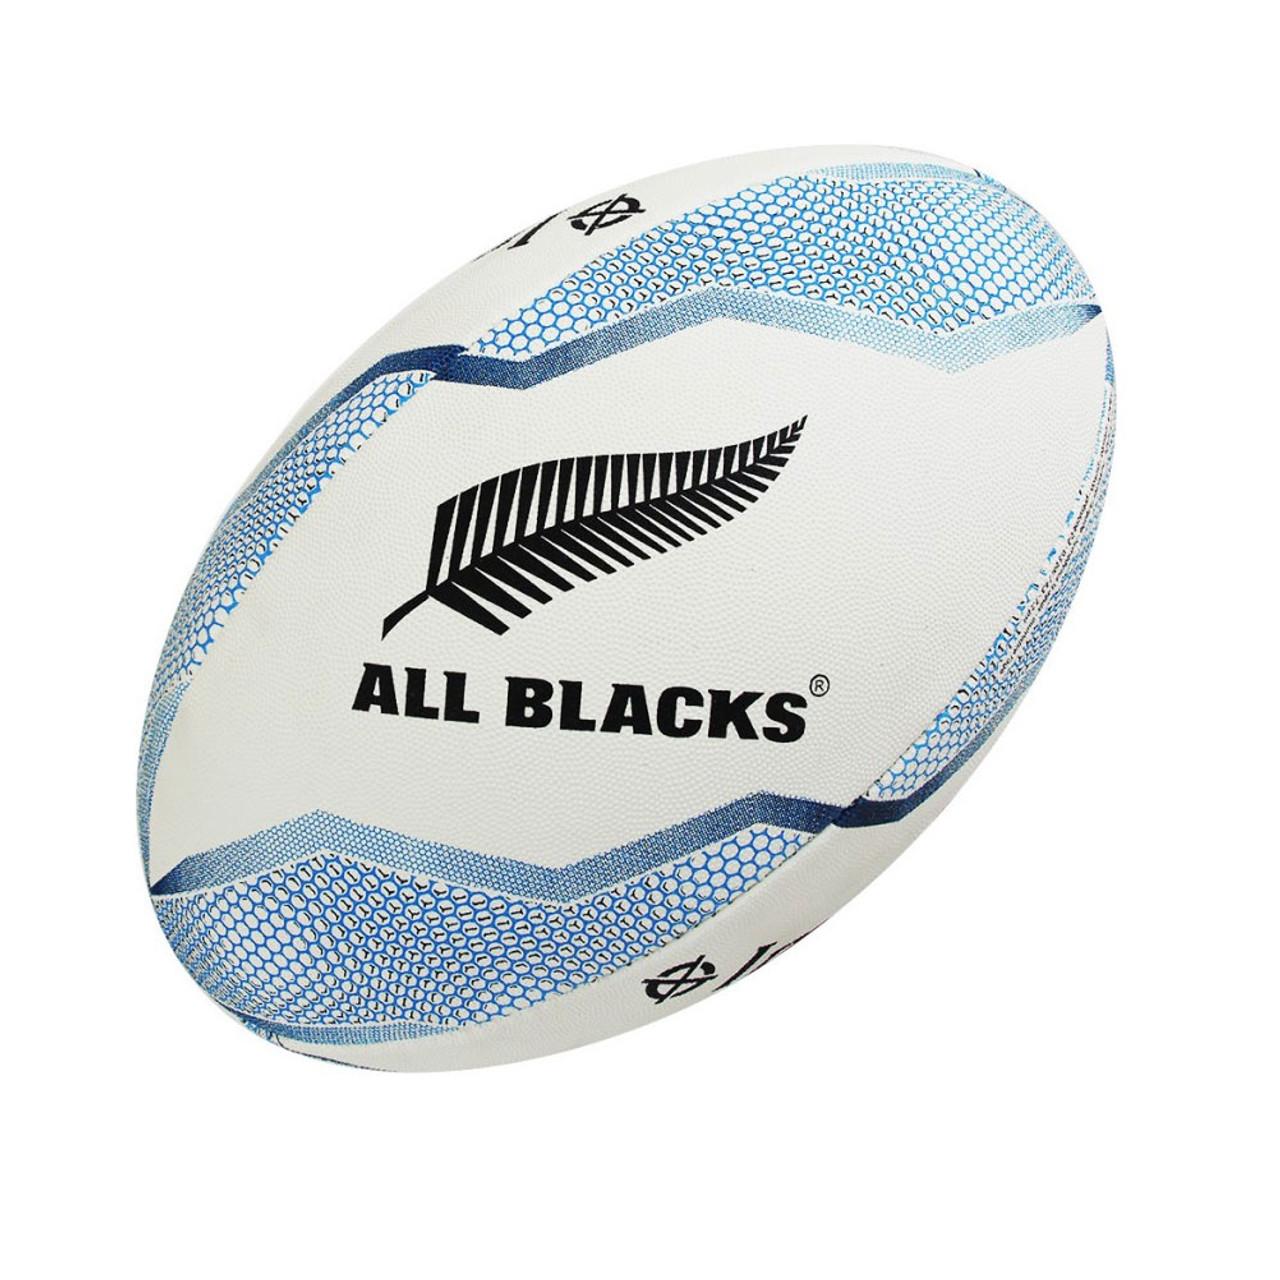 timeless design 5a42b 111d5 ADIDAS Replica All Blacks Rugby ball size 5 [white/blue]